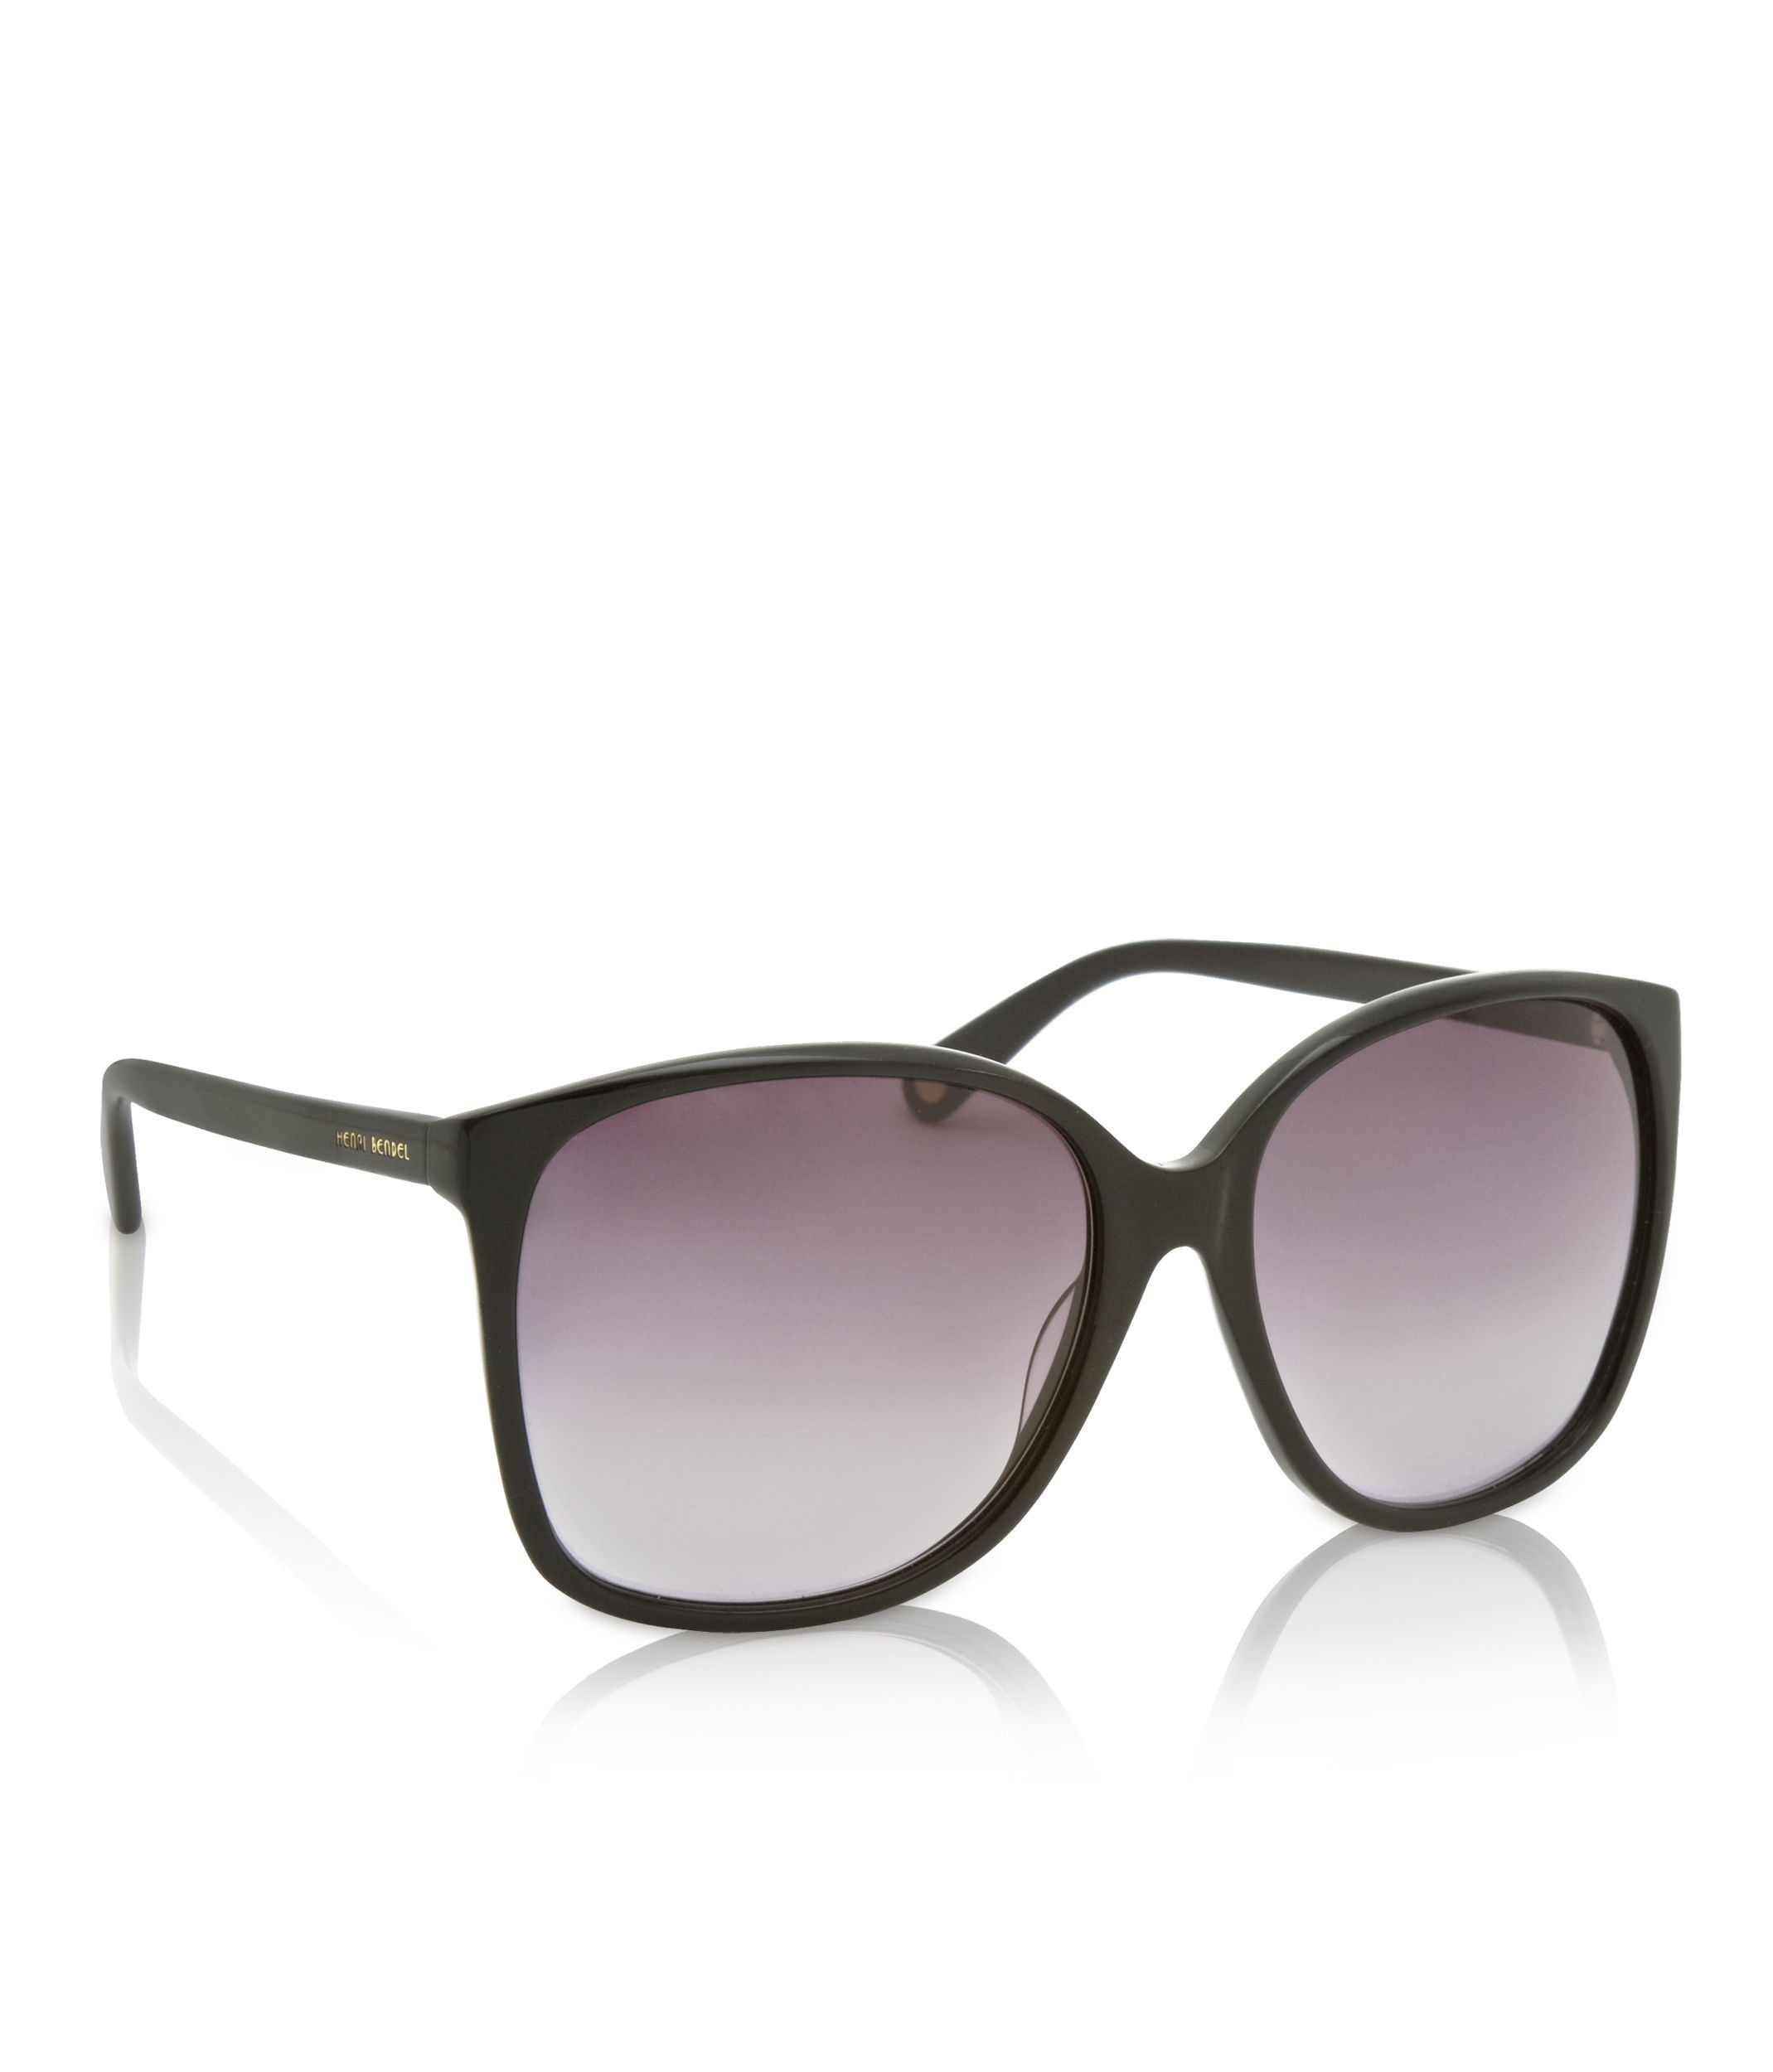 d3497d5ca48 Lyst - Henri Bendel Socialite Oversized Square Sunglasses in Black